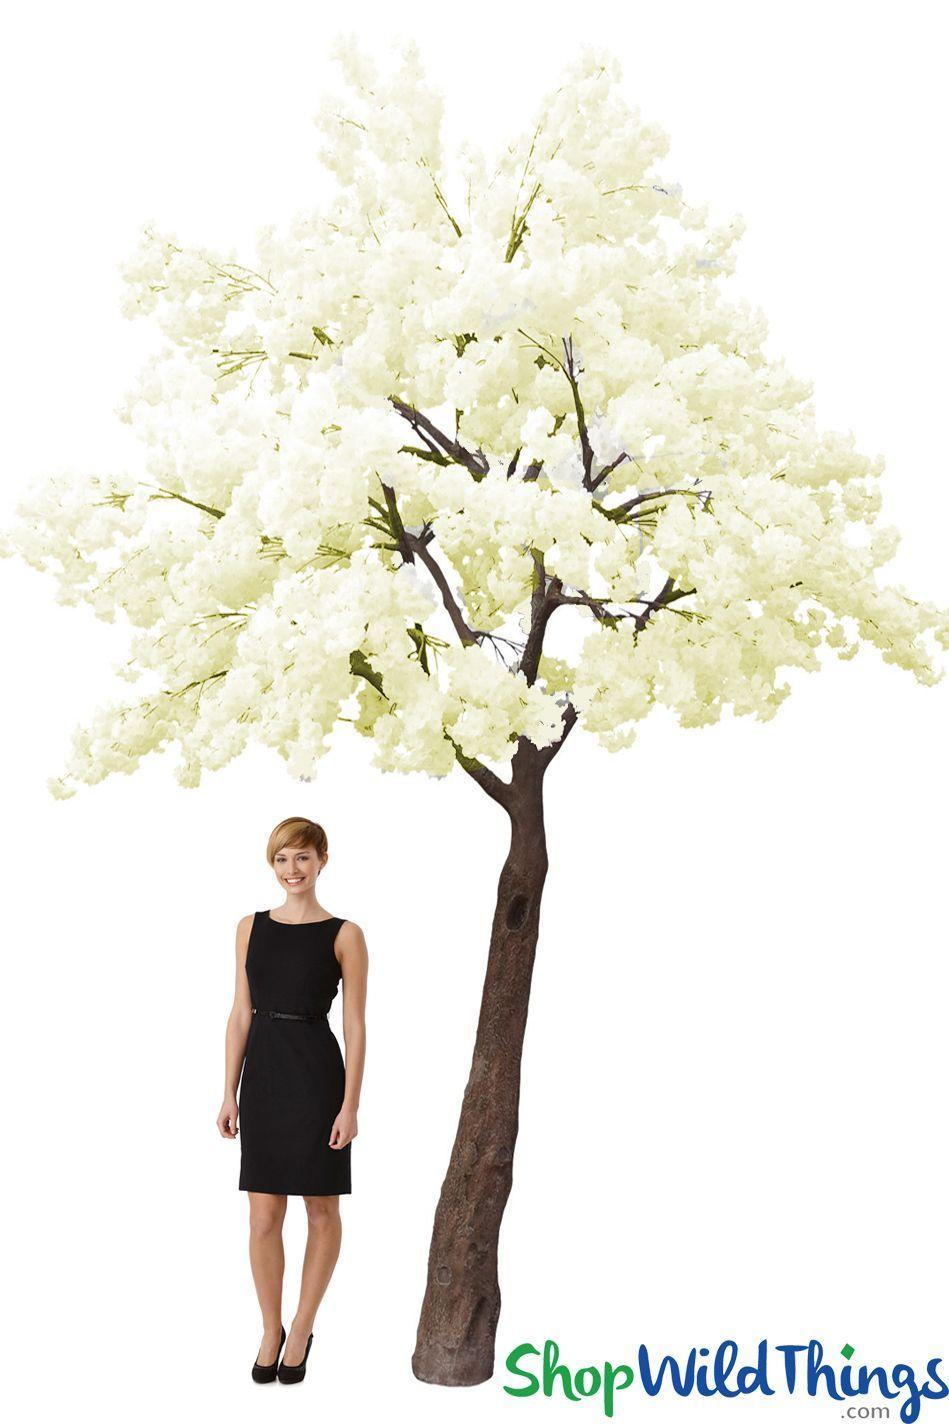 Flowering Dogwood Tree 14' Tall x 13' Wide Cream